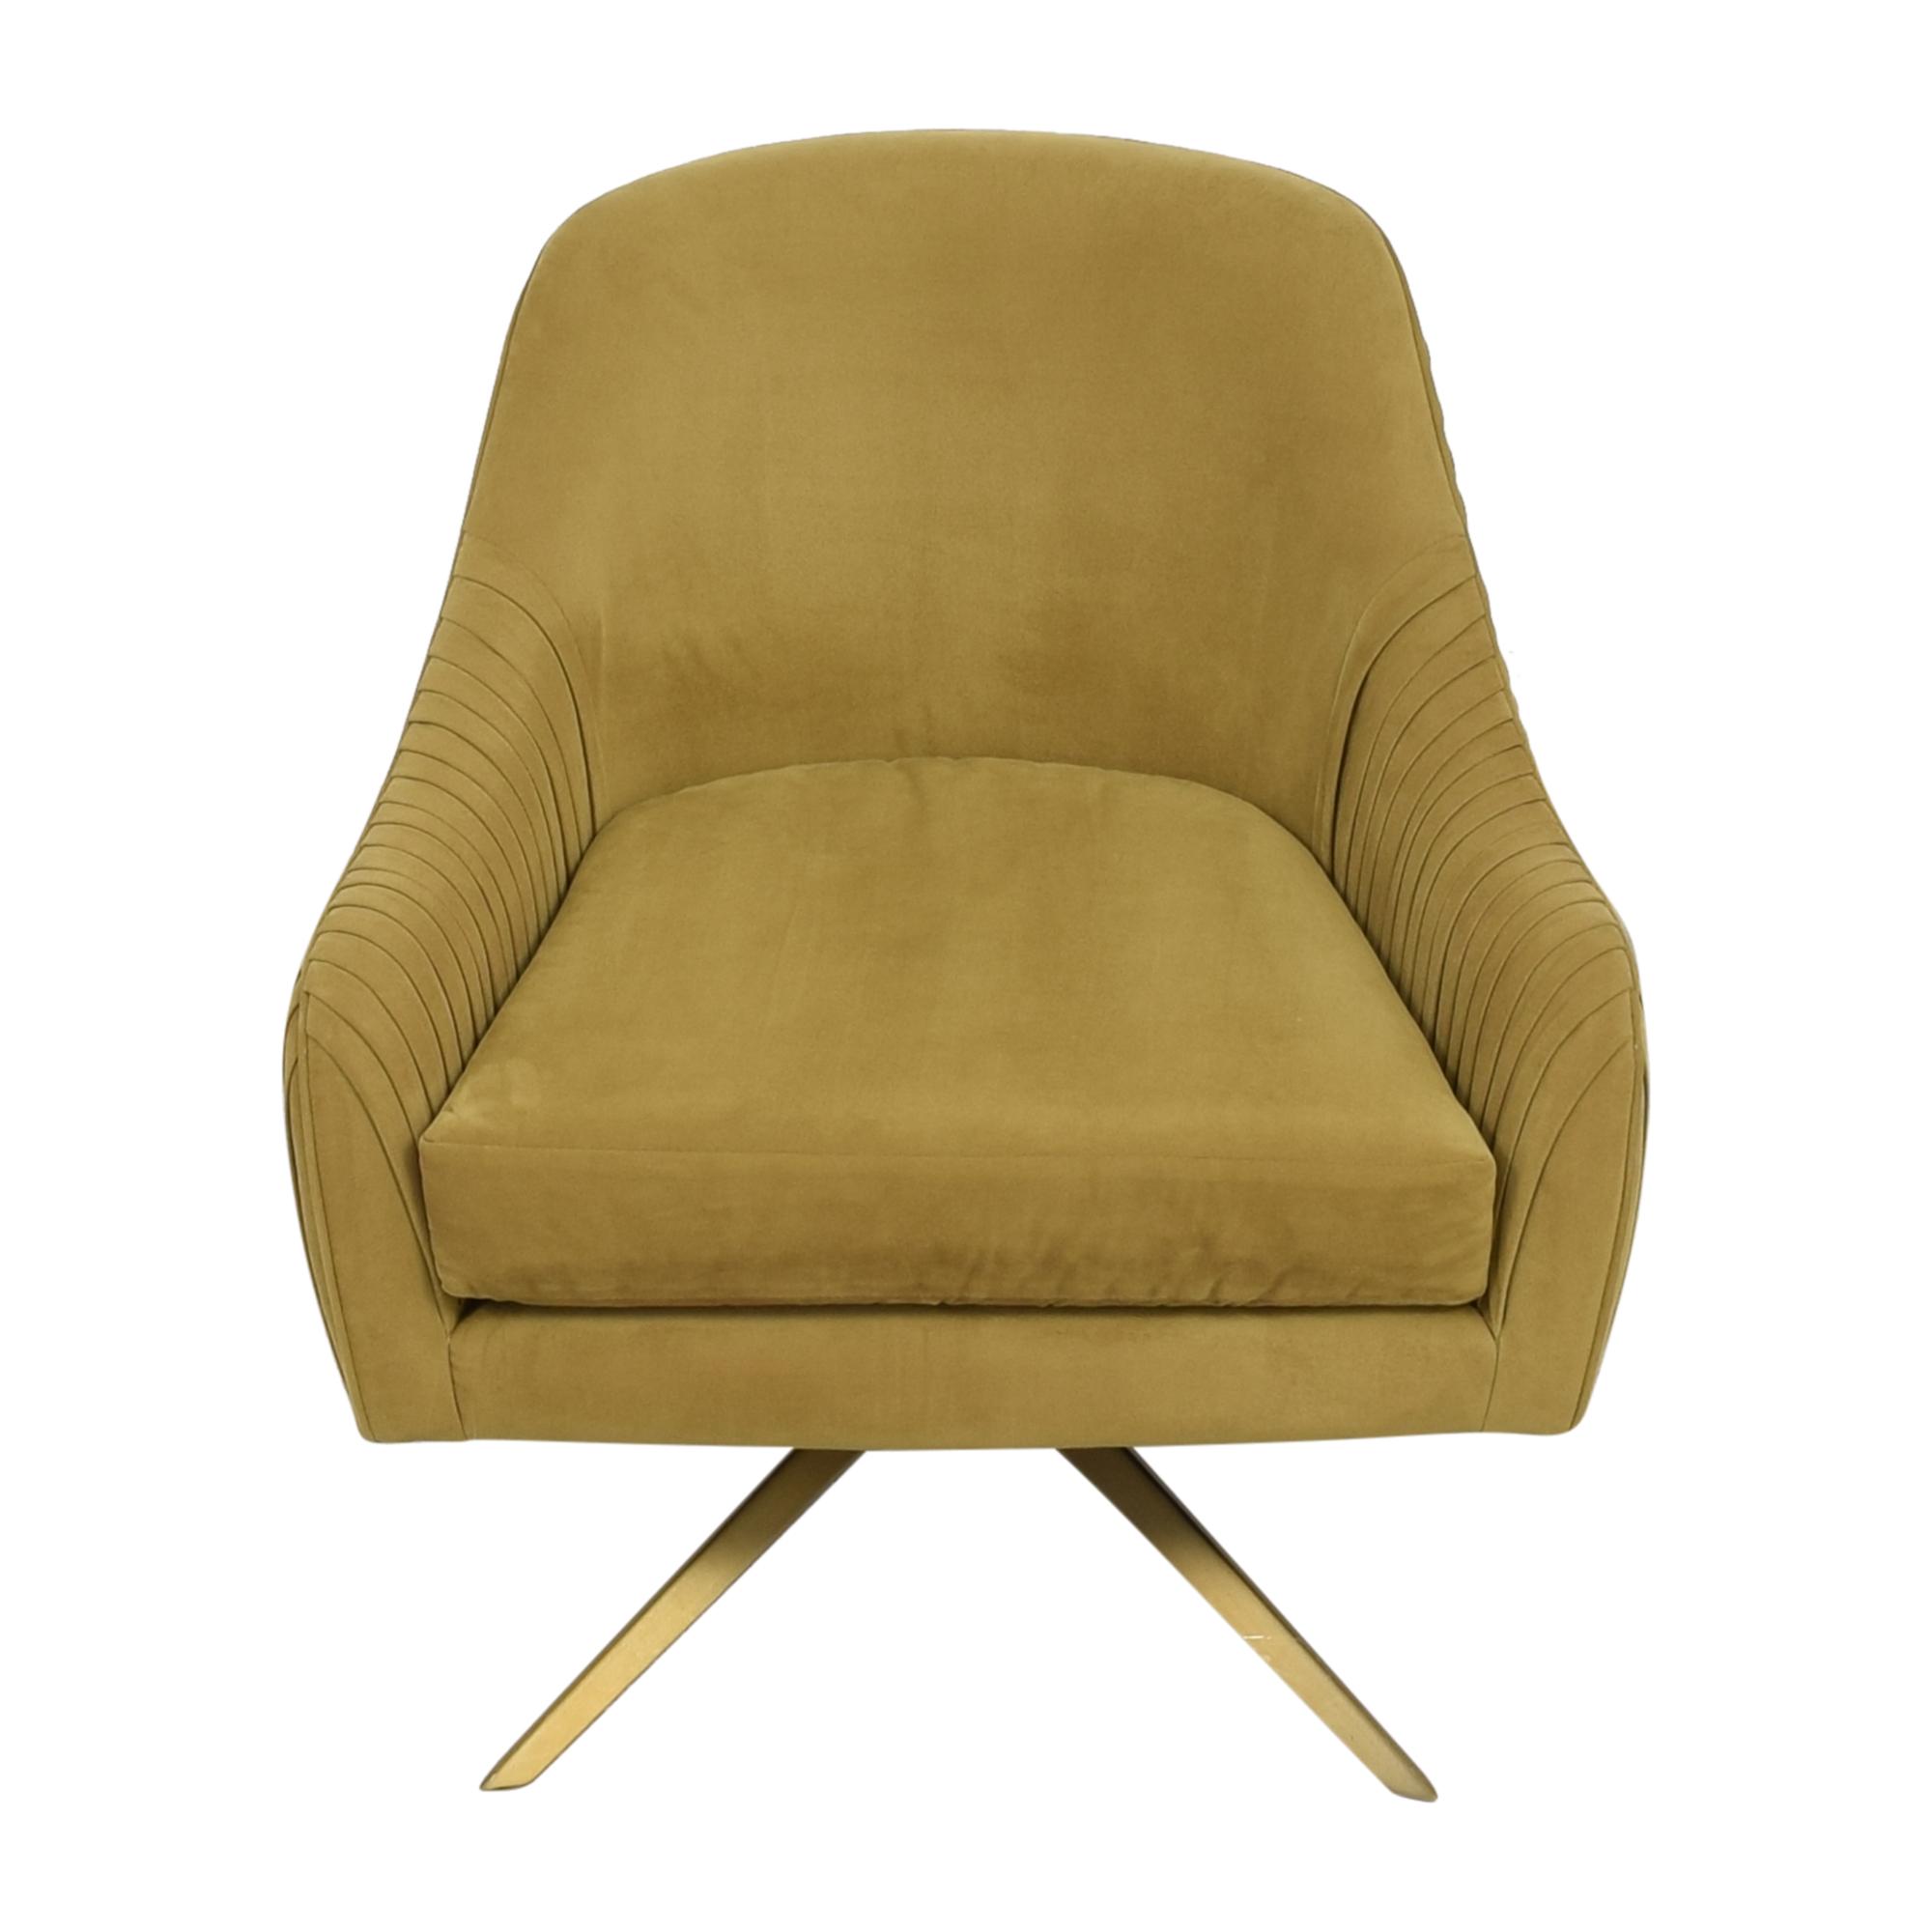 West Elm West Elm Roar & Rabbit Pleated Swivel Chair ct